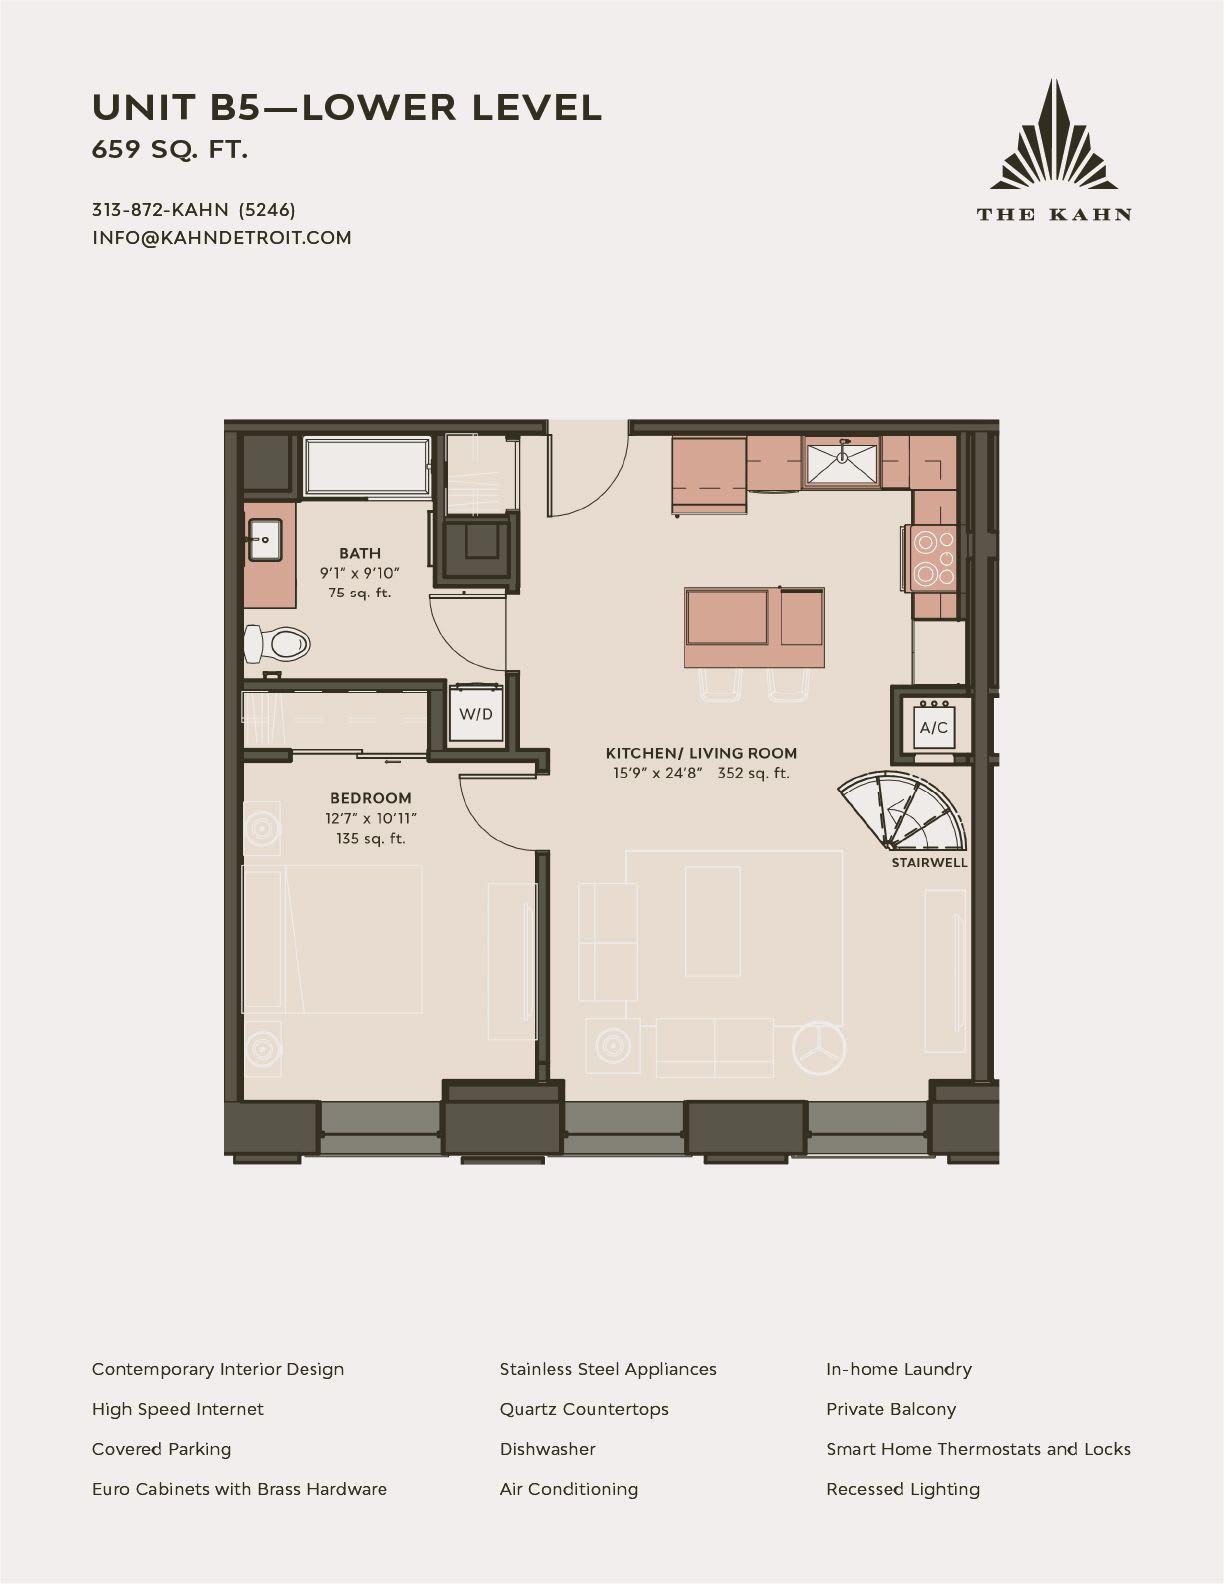 B5 floor plan image at The Kahn in Detroit, Michigan